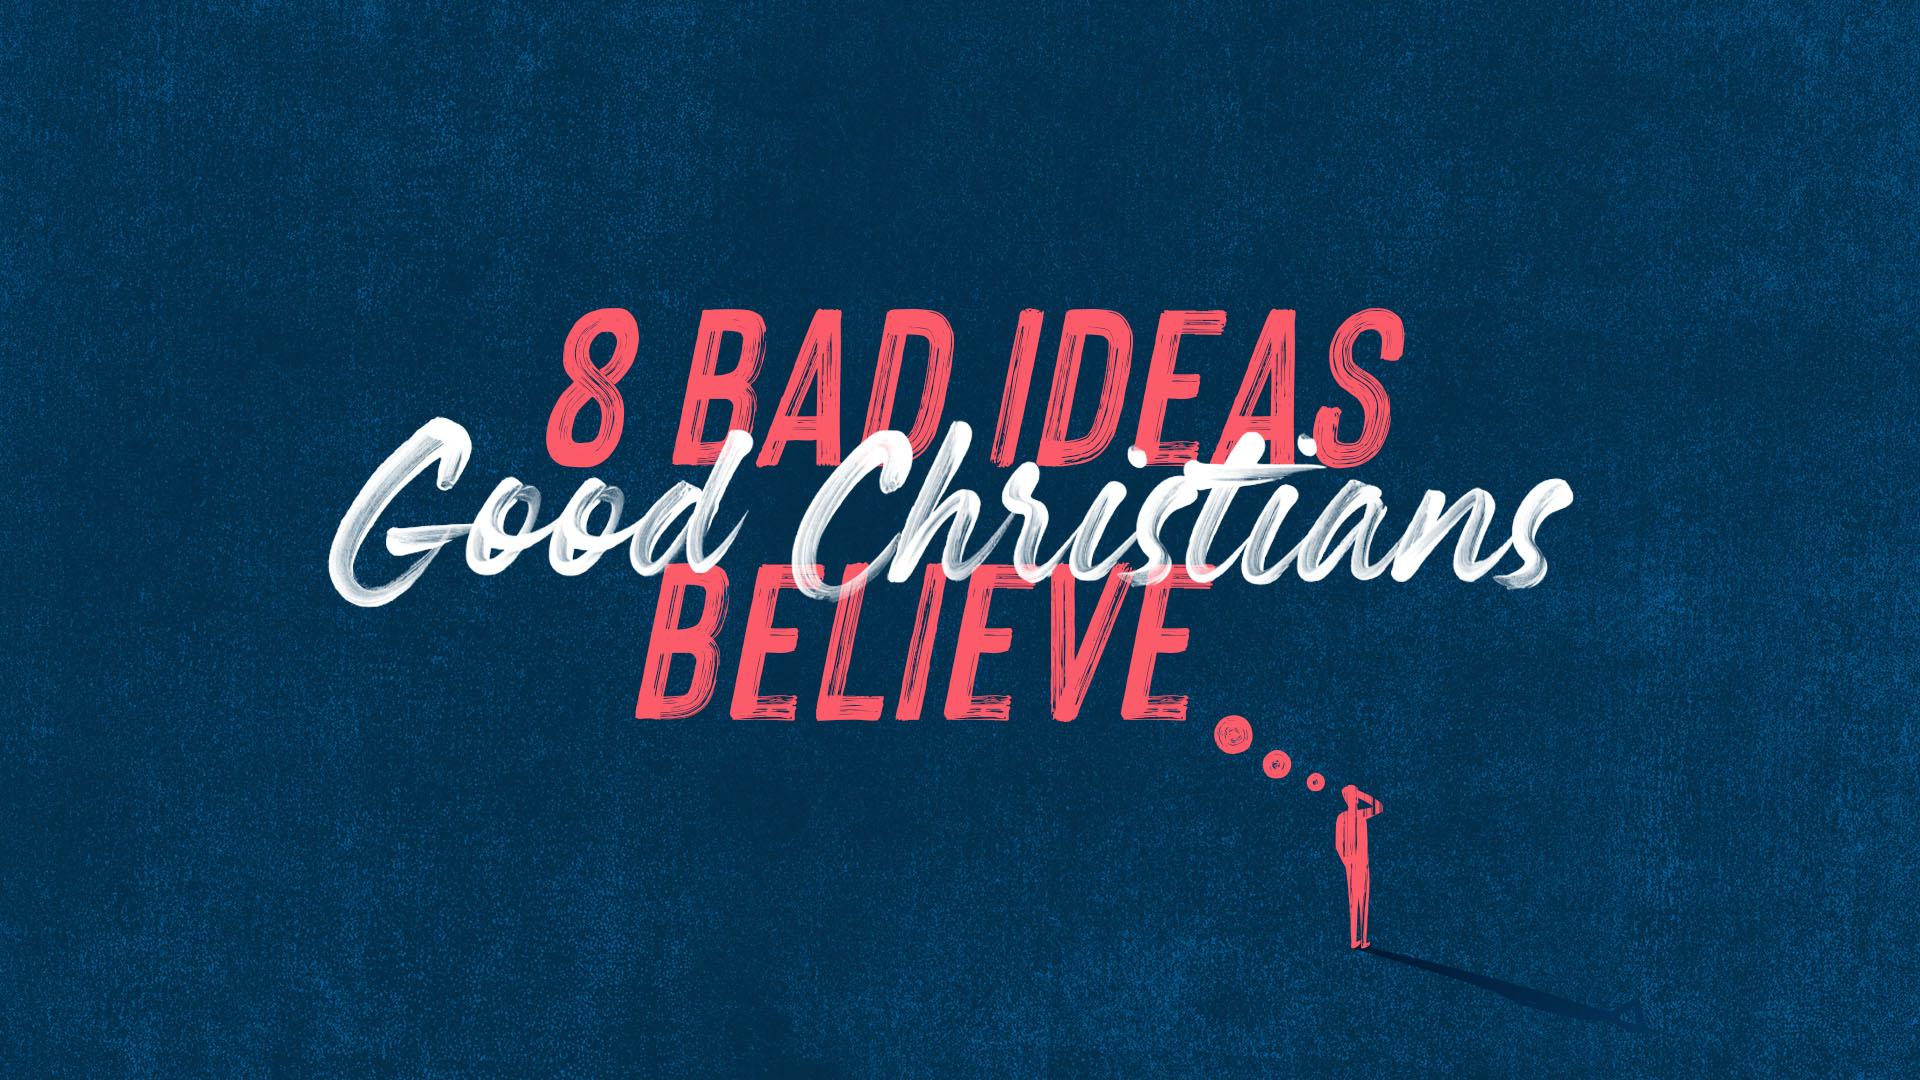 Do Good Christians Have Doubts about God?